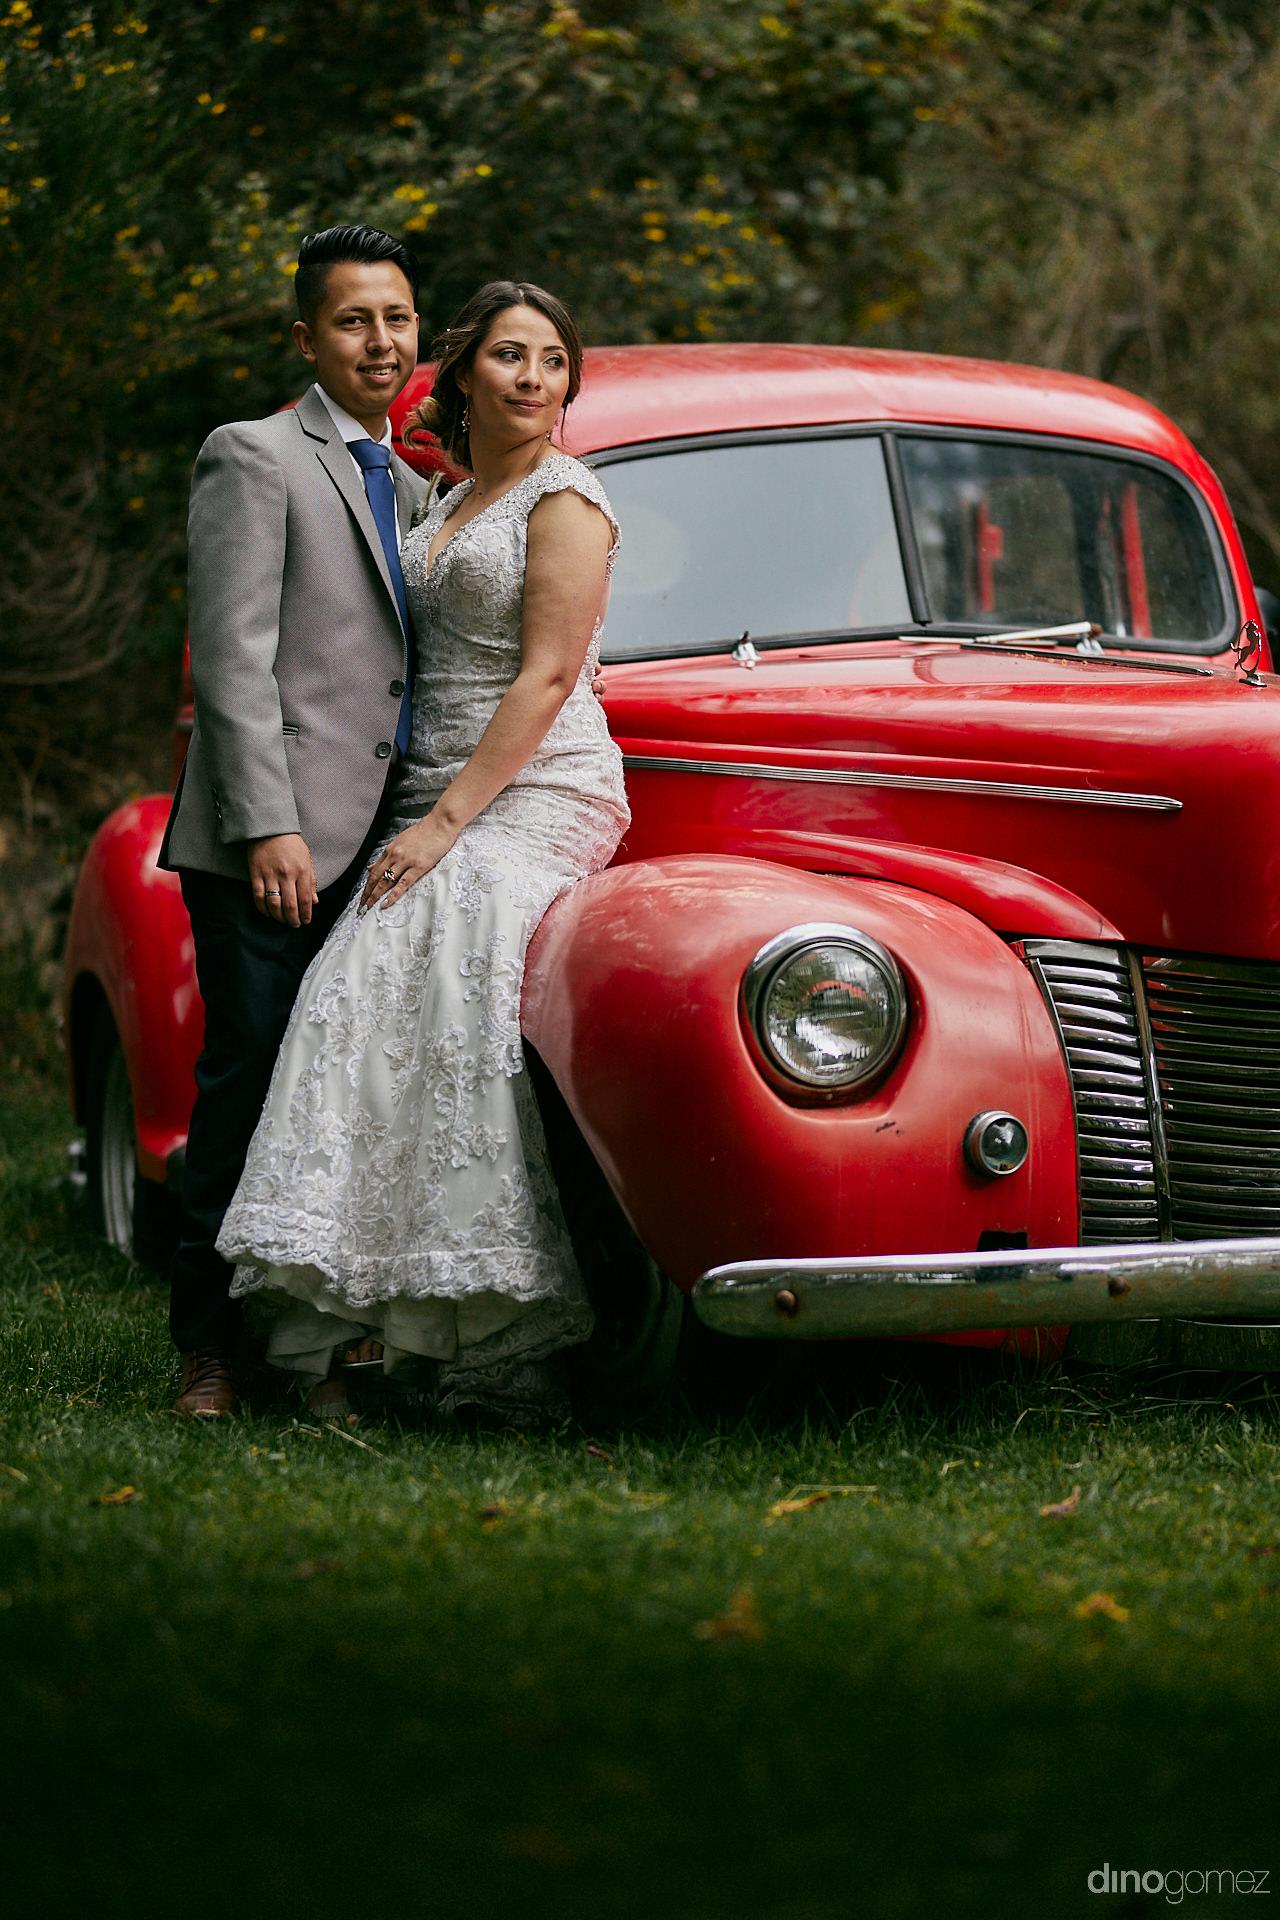 021 - Diy Budget Destination Weddings Can Be Prety Too!